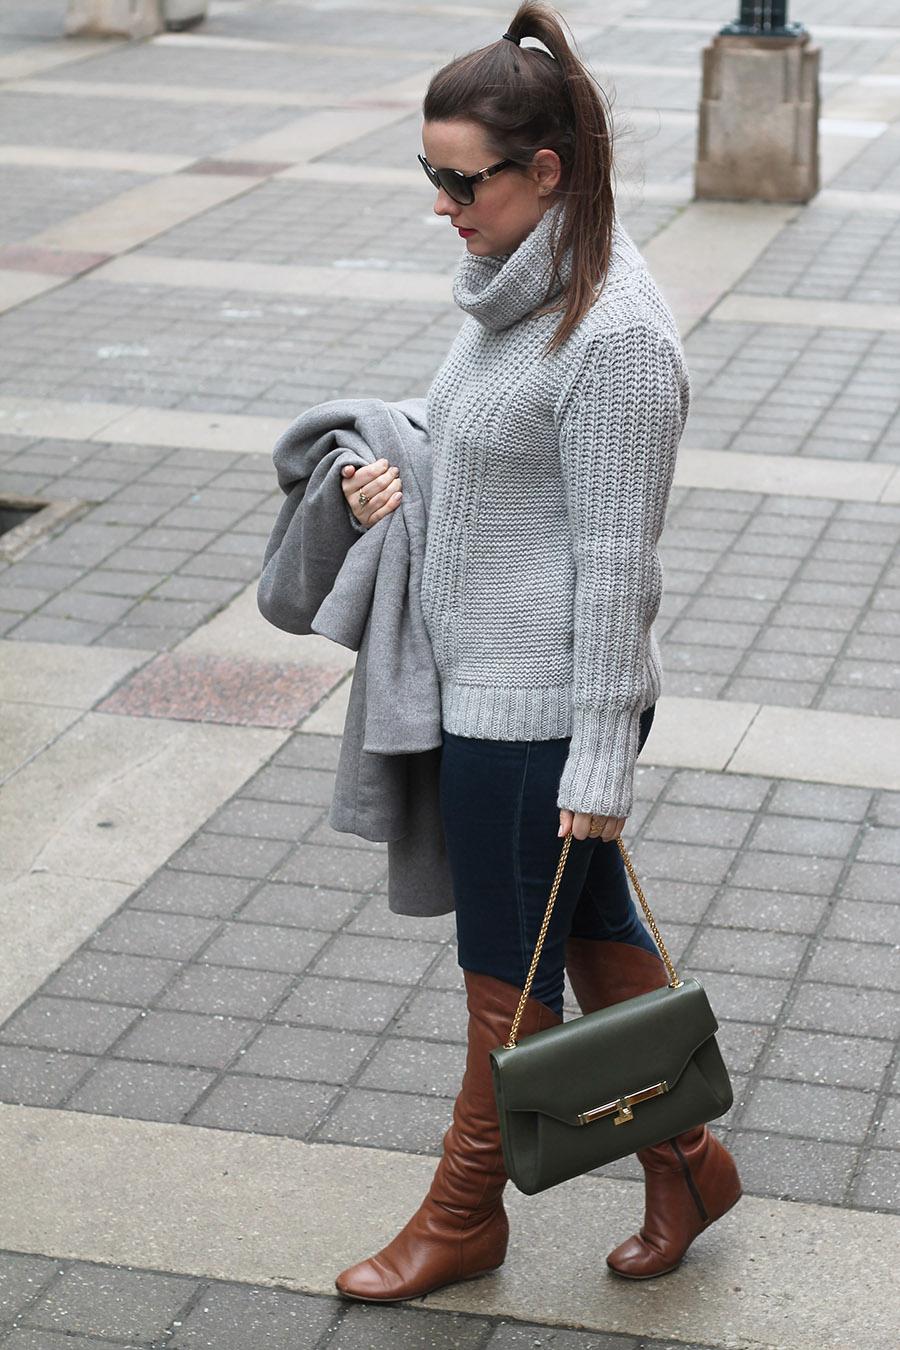 Toronto Fashion Blogger, Grey Tur